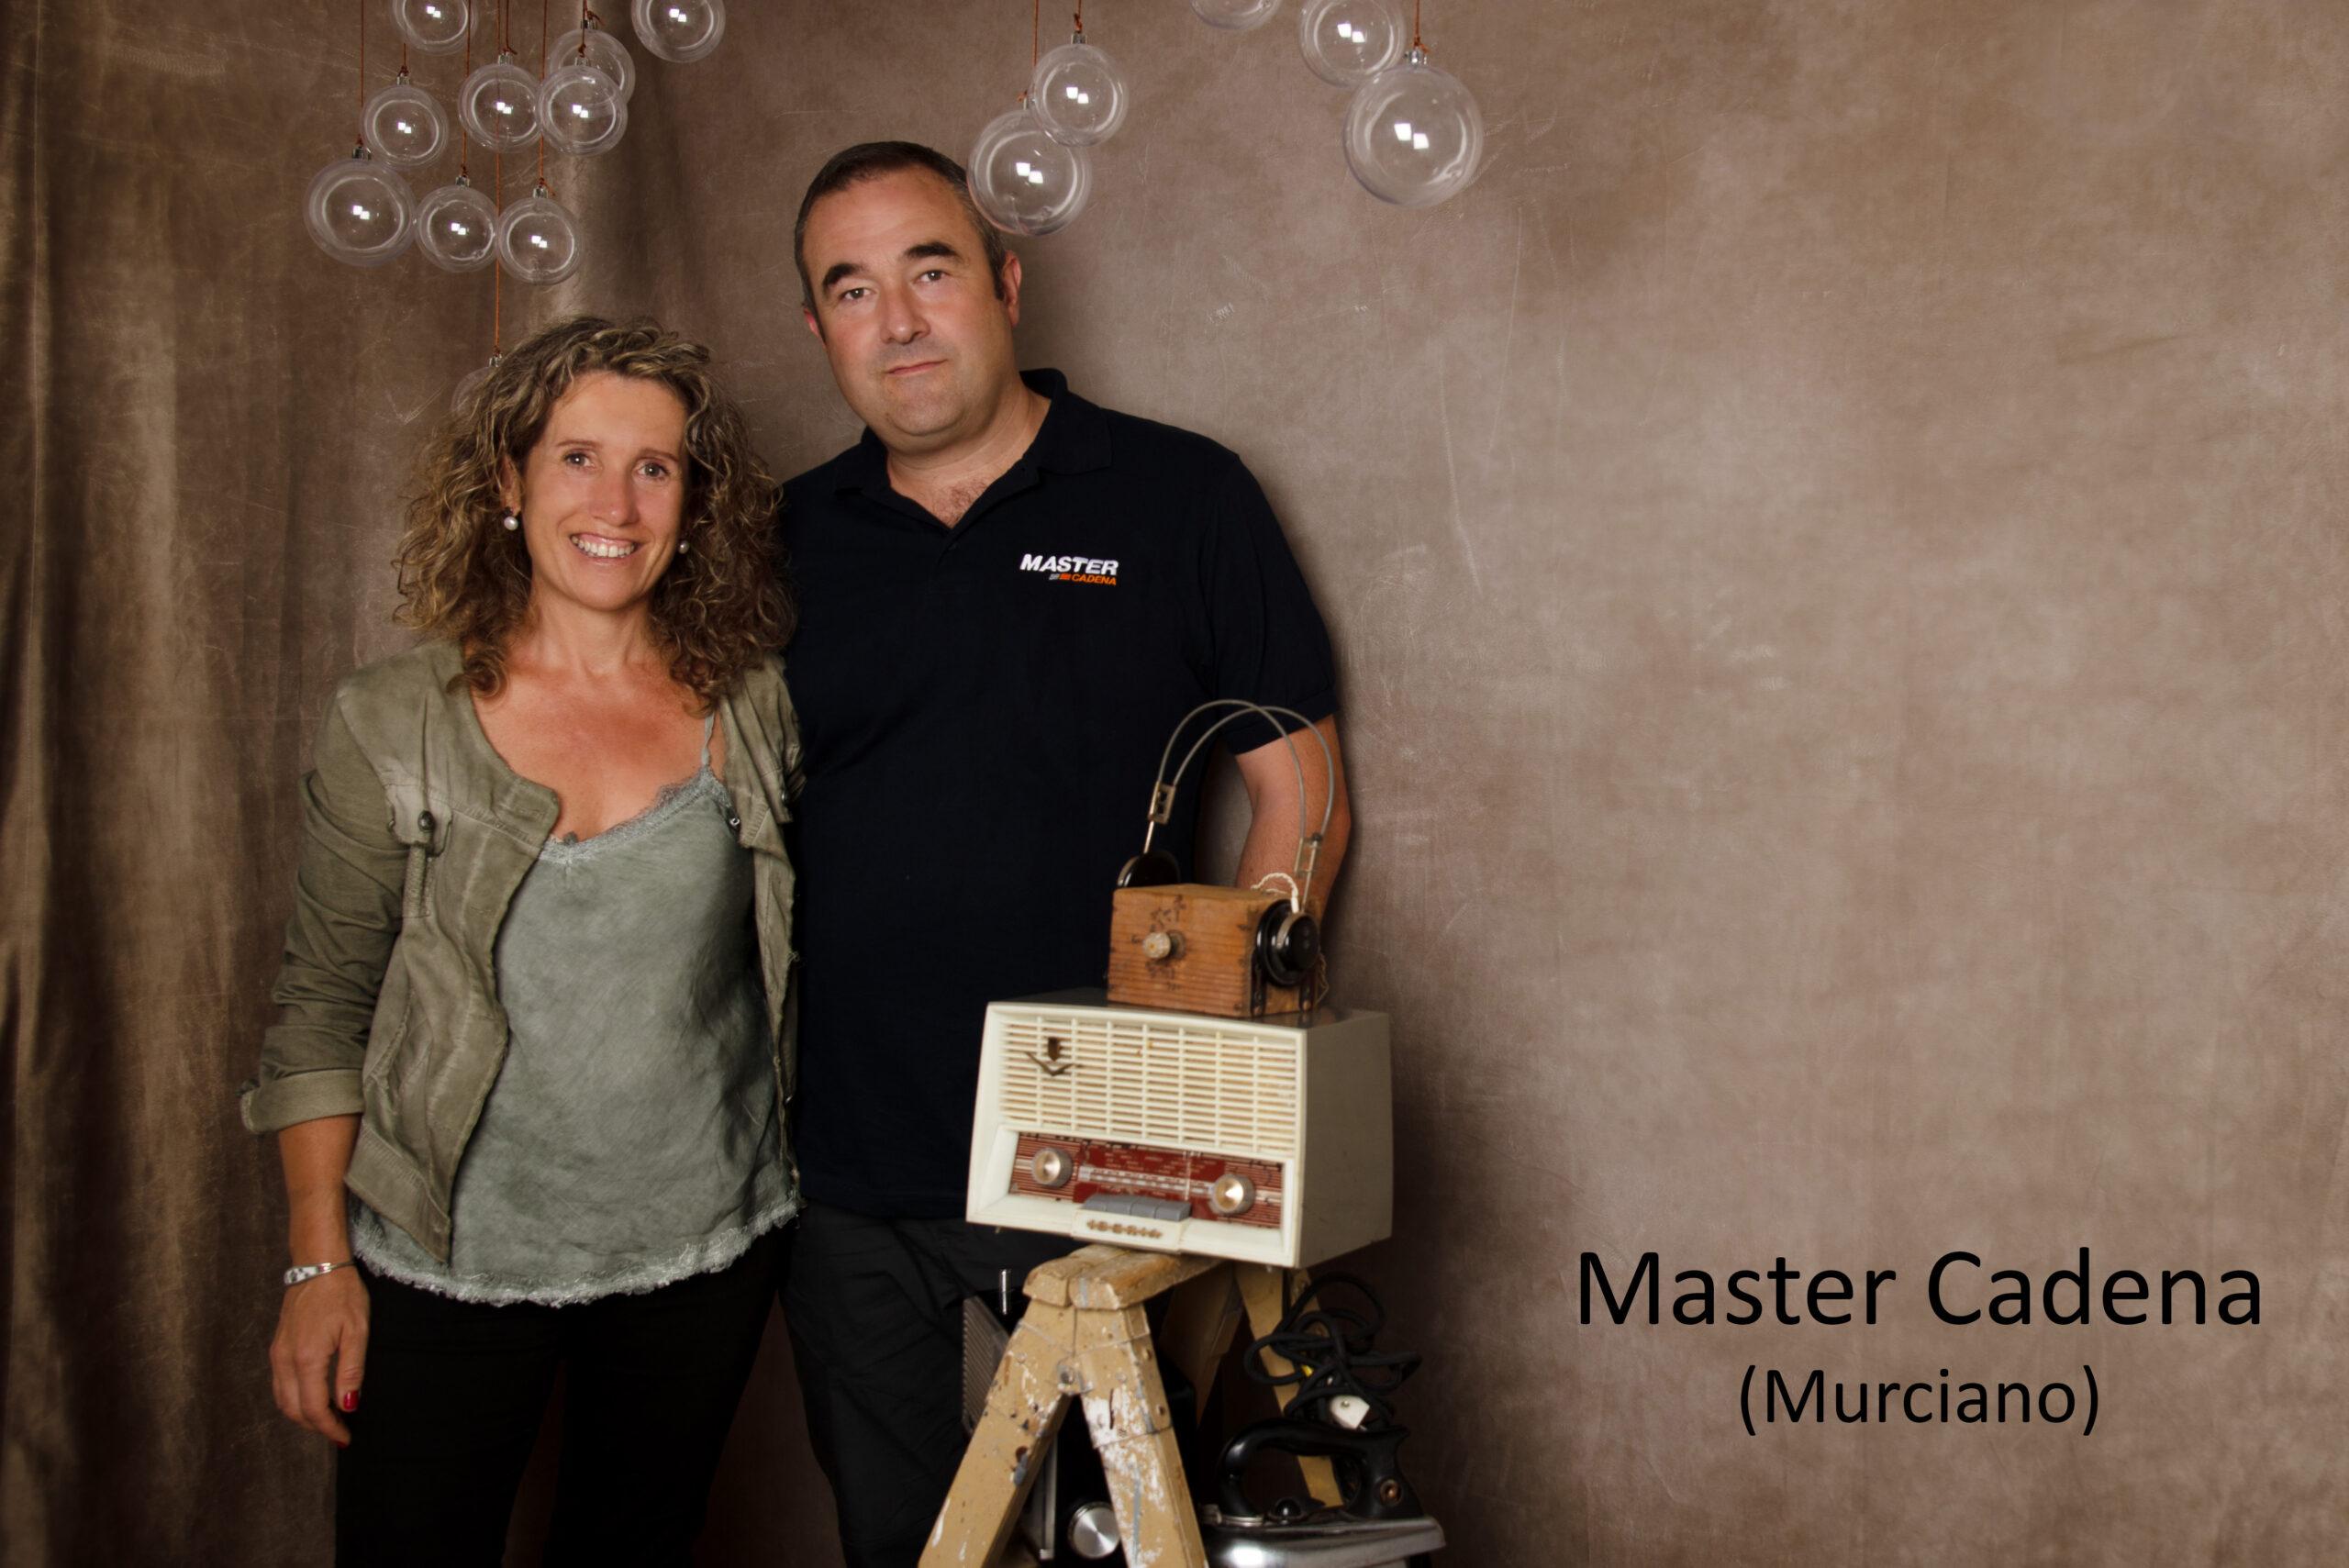 Master Cadena (Murciano)